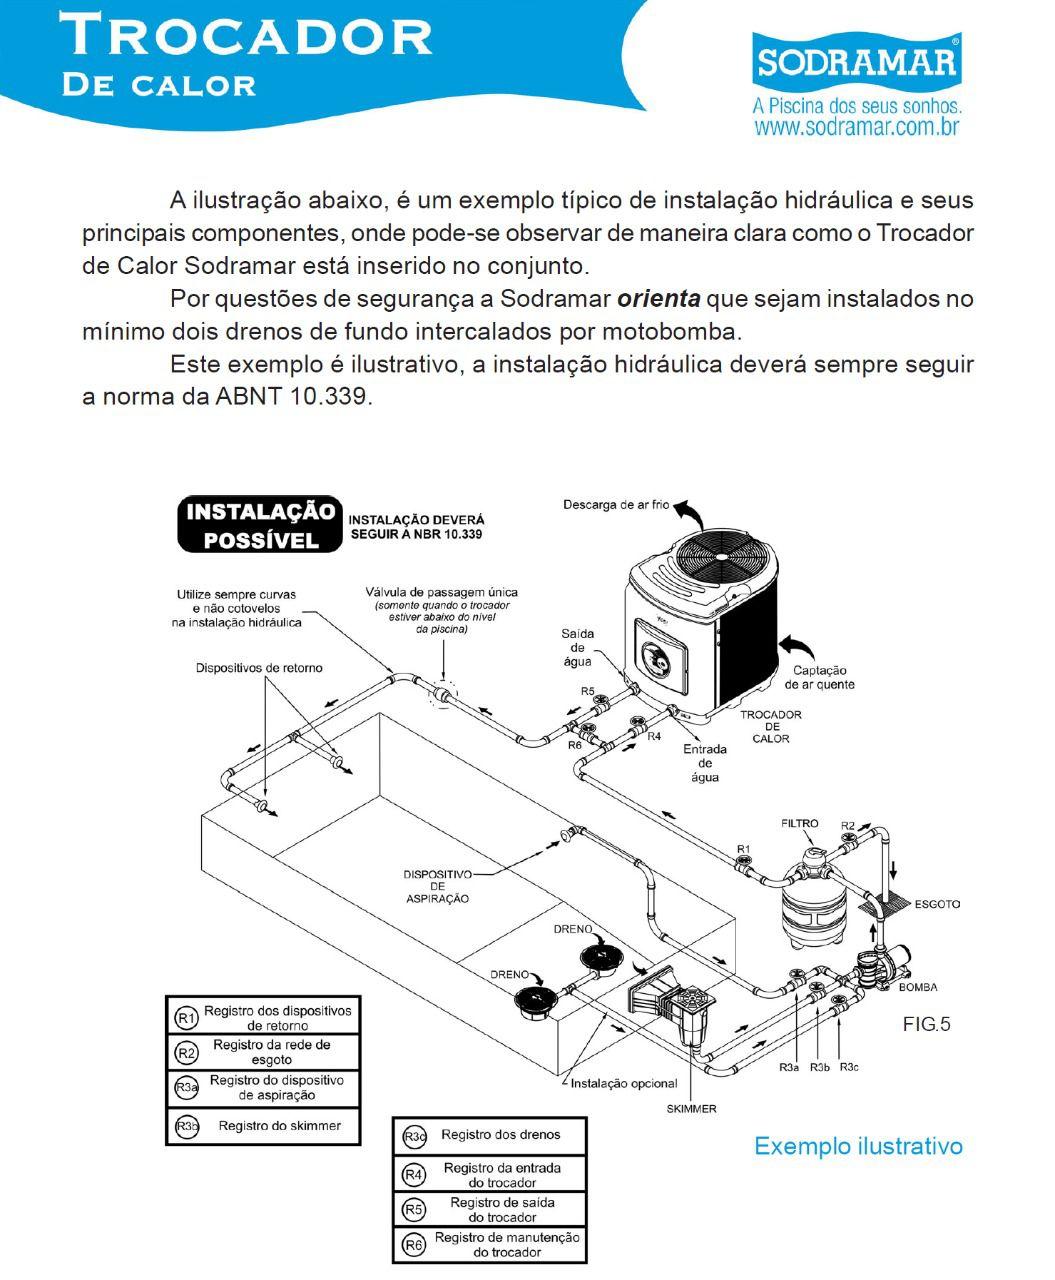 Aquecedor de piscina Yes - Trocador de Calor SD-80 Trif 220V